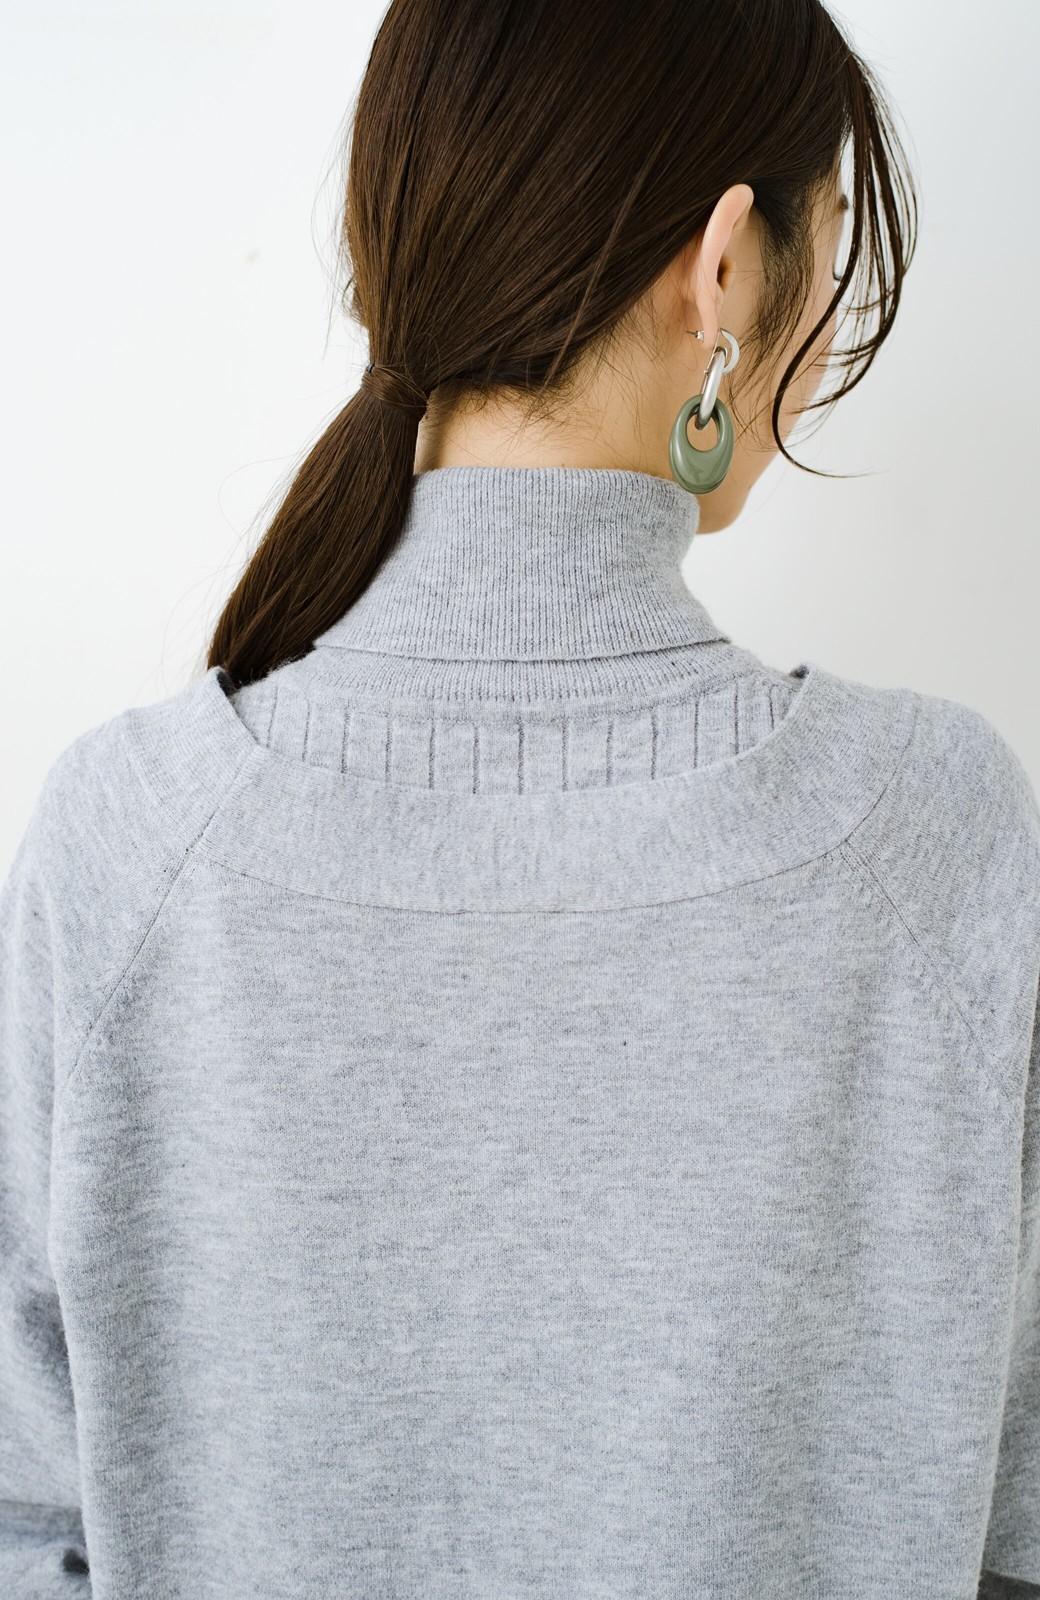 haco! セットで着るだけパッとかわいい ニットトップス&ノースリーブニットワンピースセット <グレー>の商品写真8